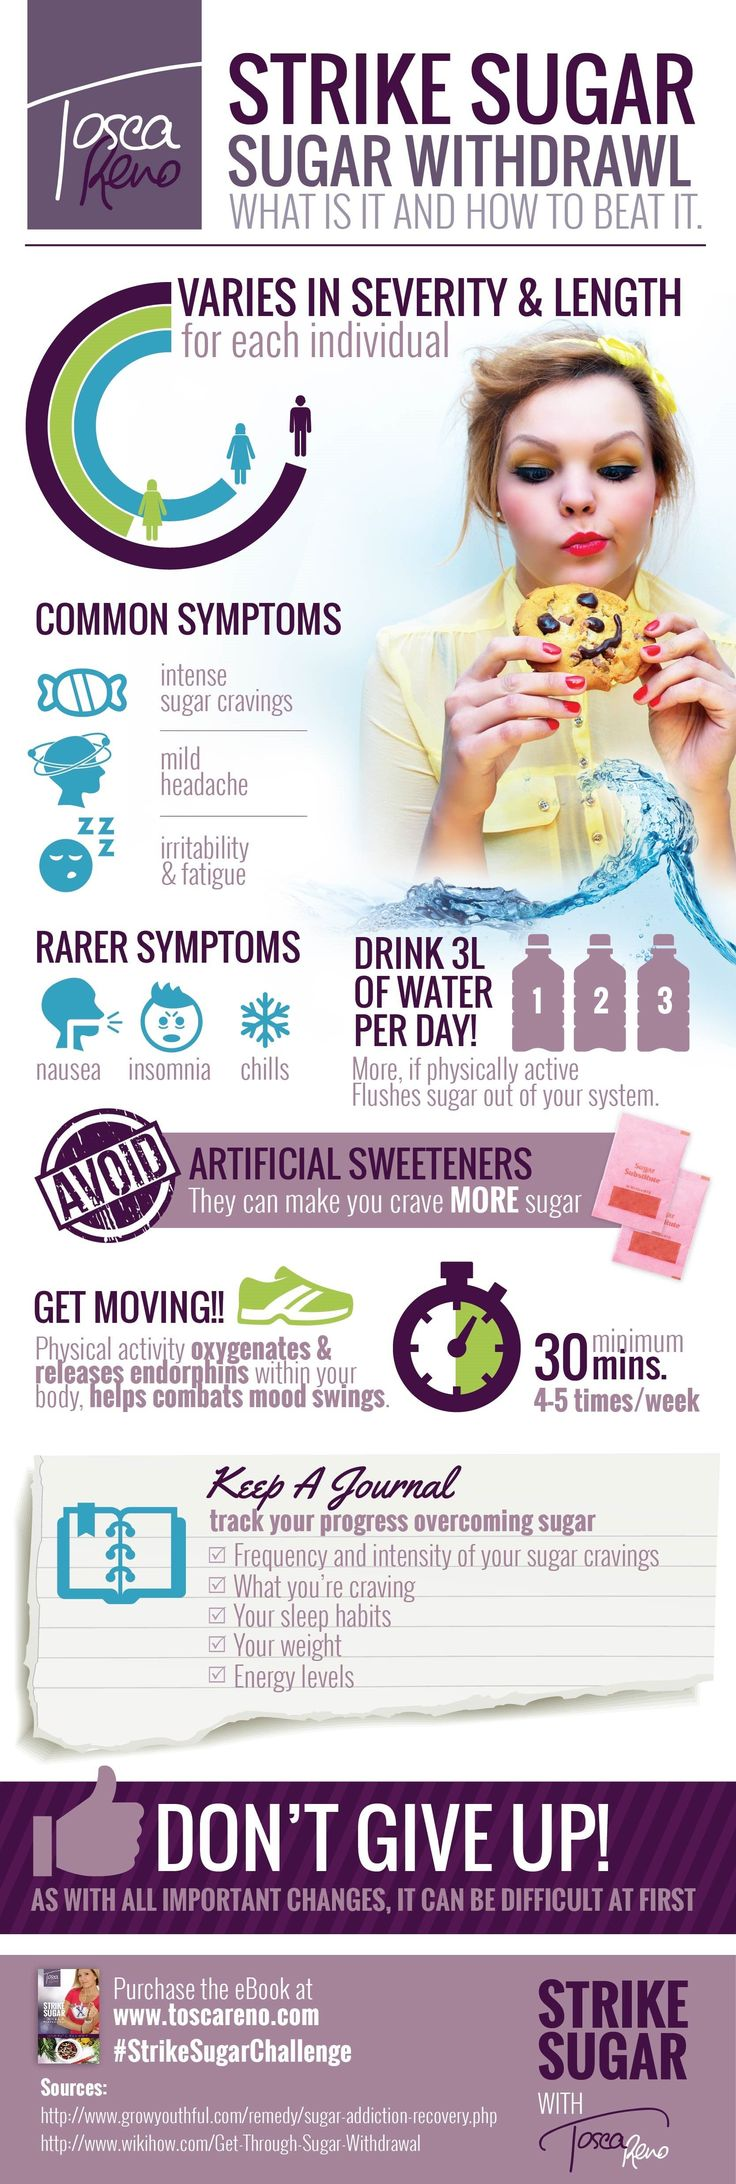 balanced blood sugar levels help cut those insatiable sugar cravings. A healthy gut also helps! #BodyDetoxForMen